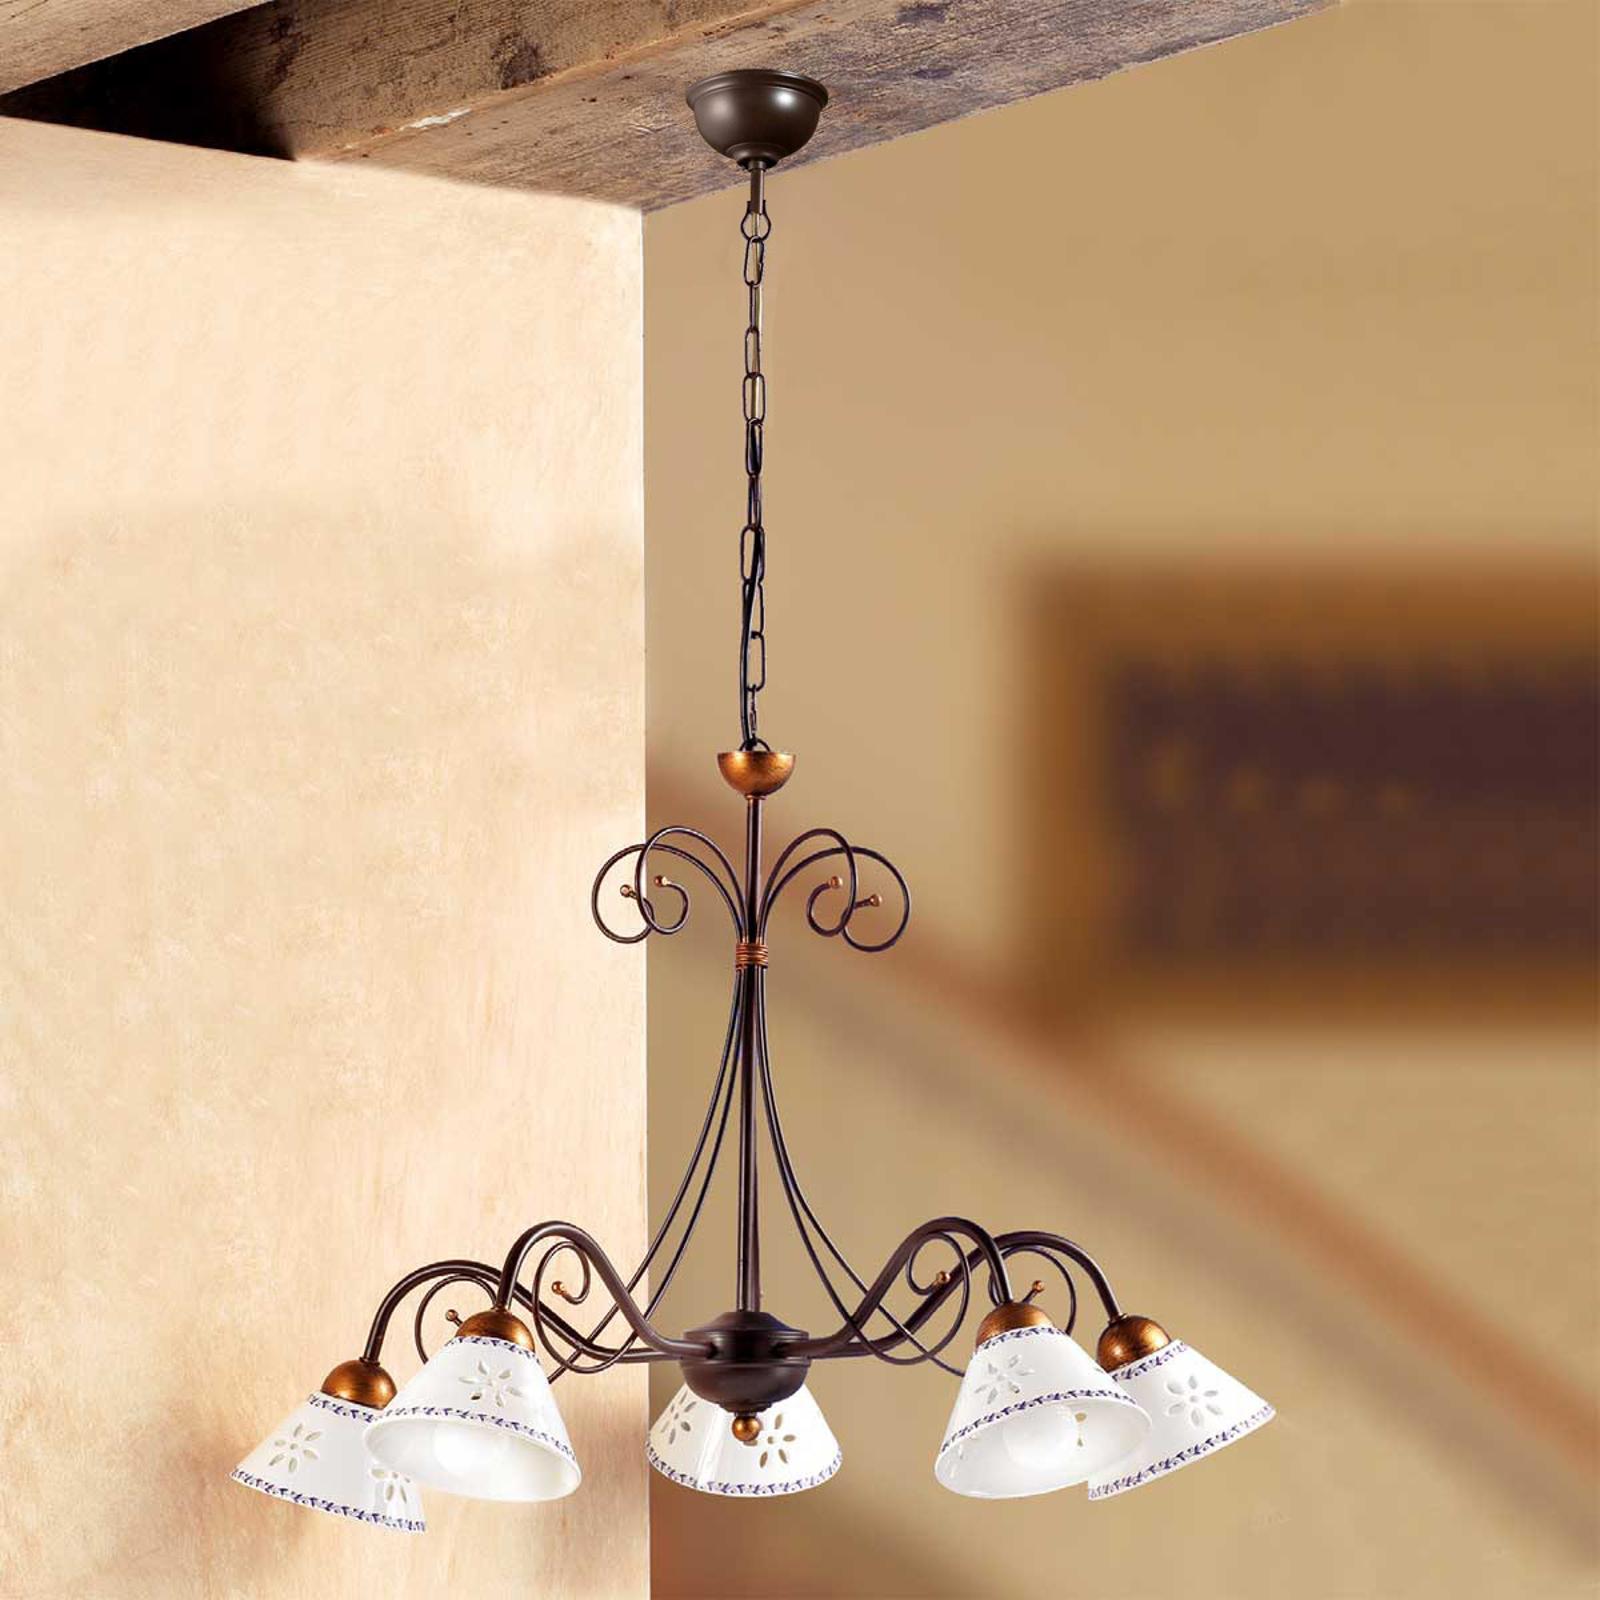 Romantische hanglamp LIBERTY, 5-lichts